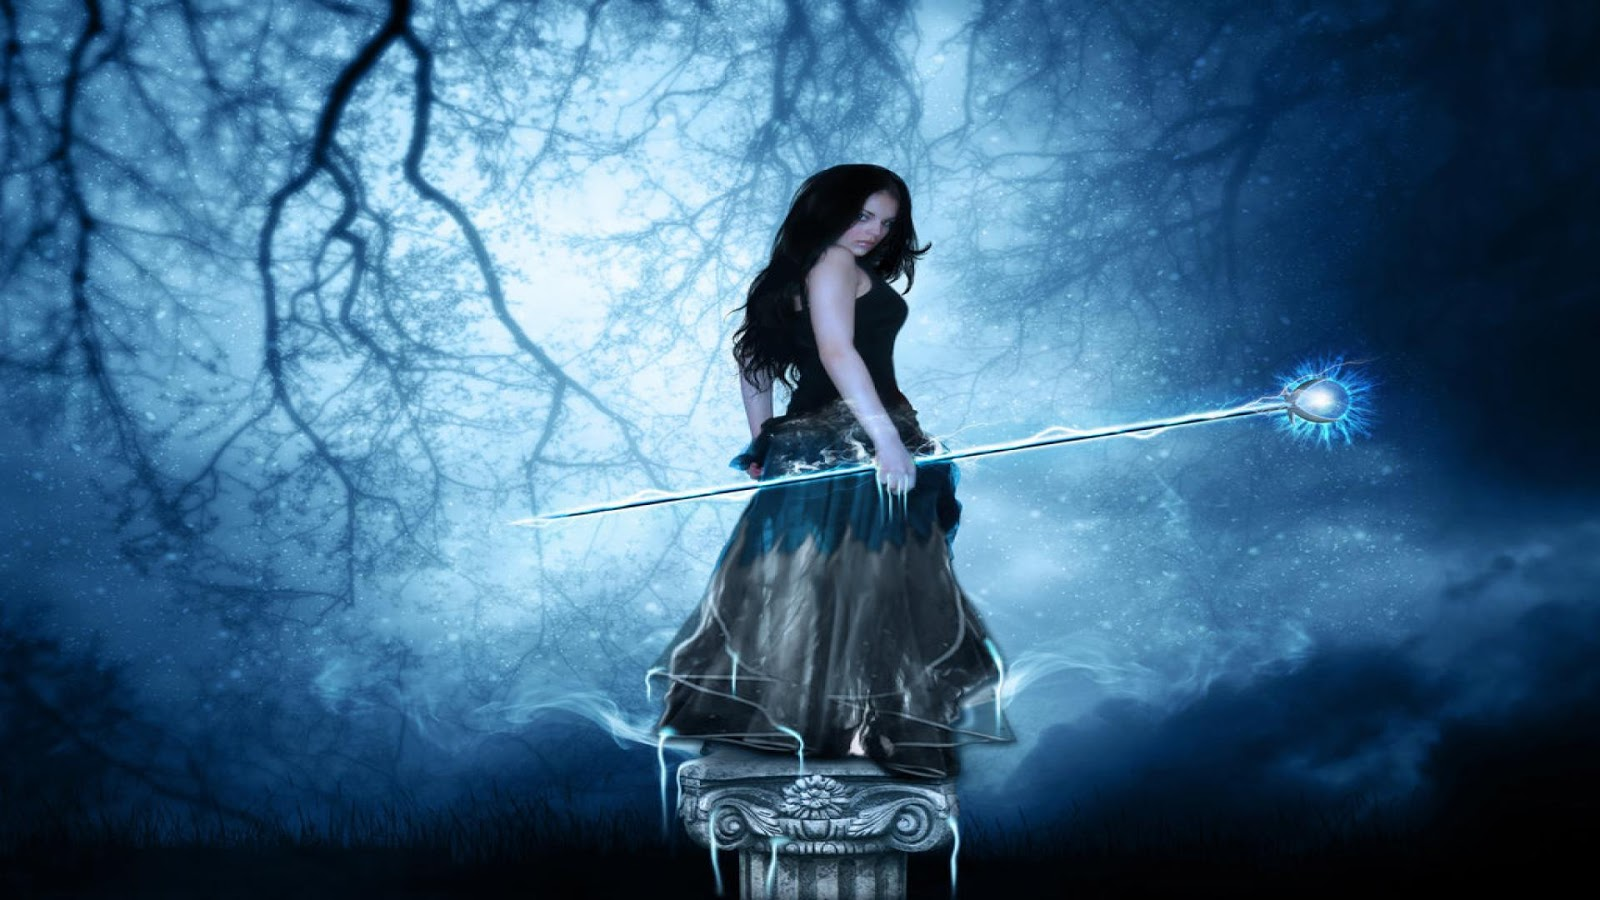 Fairy hd wallpapers - Fantasy desktop pictures ...